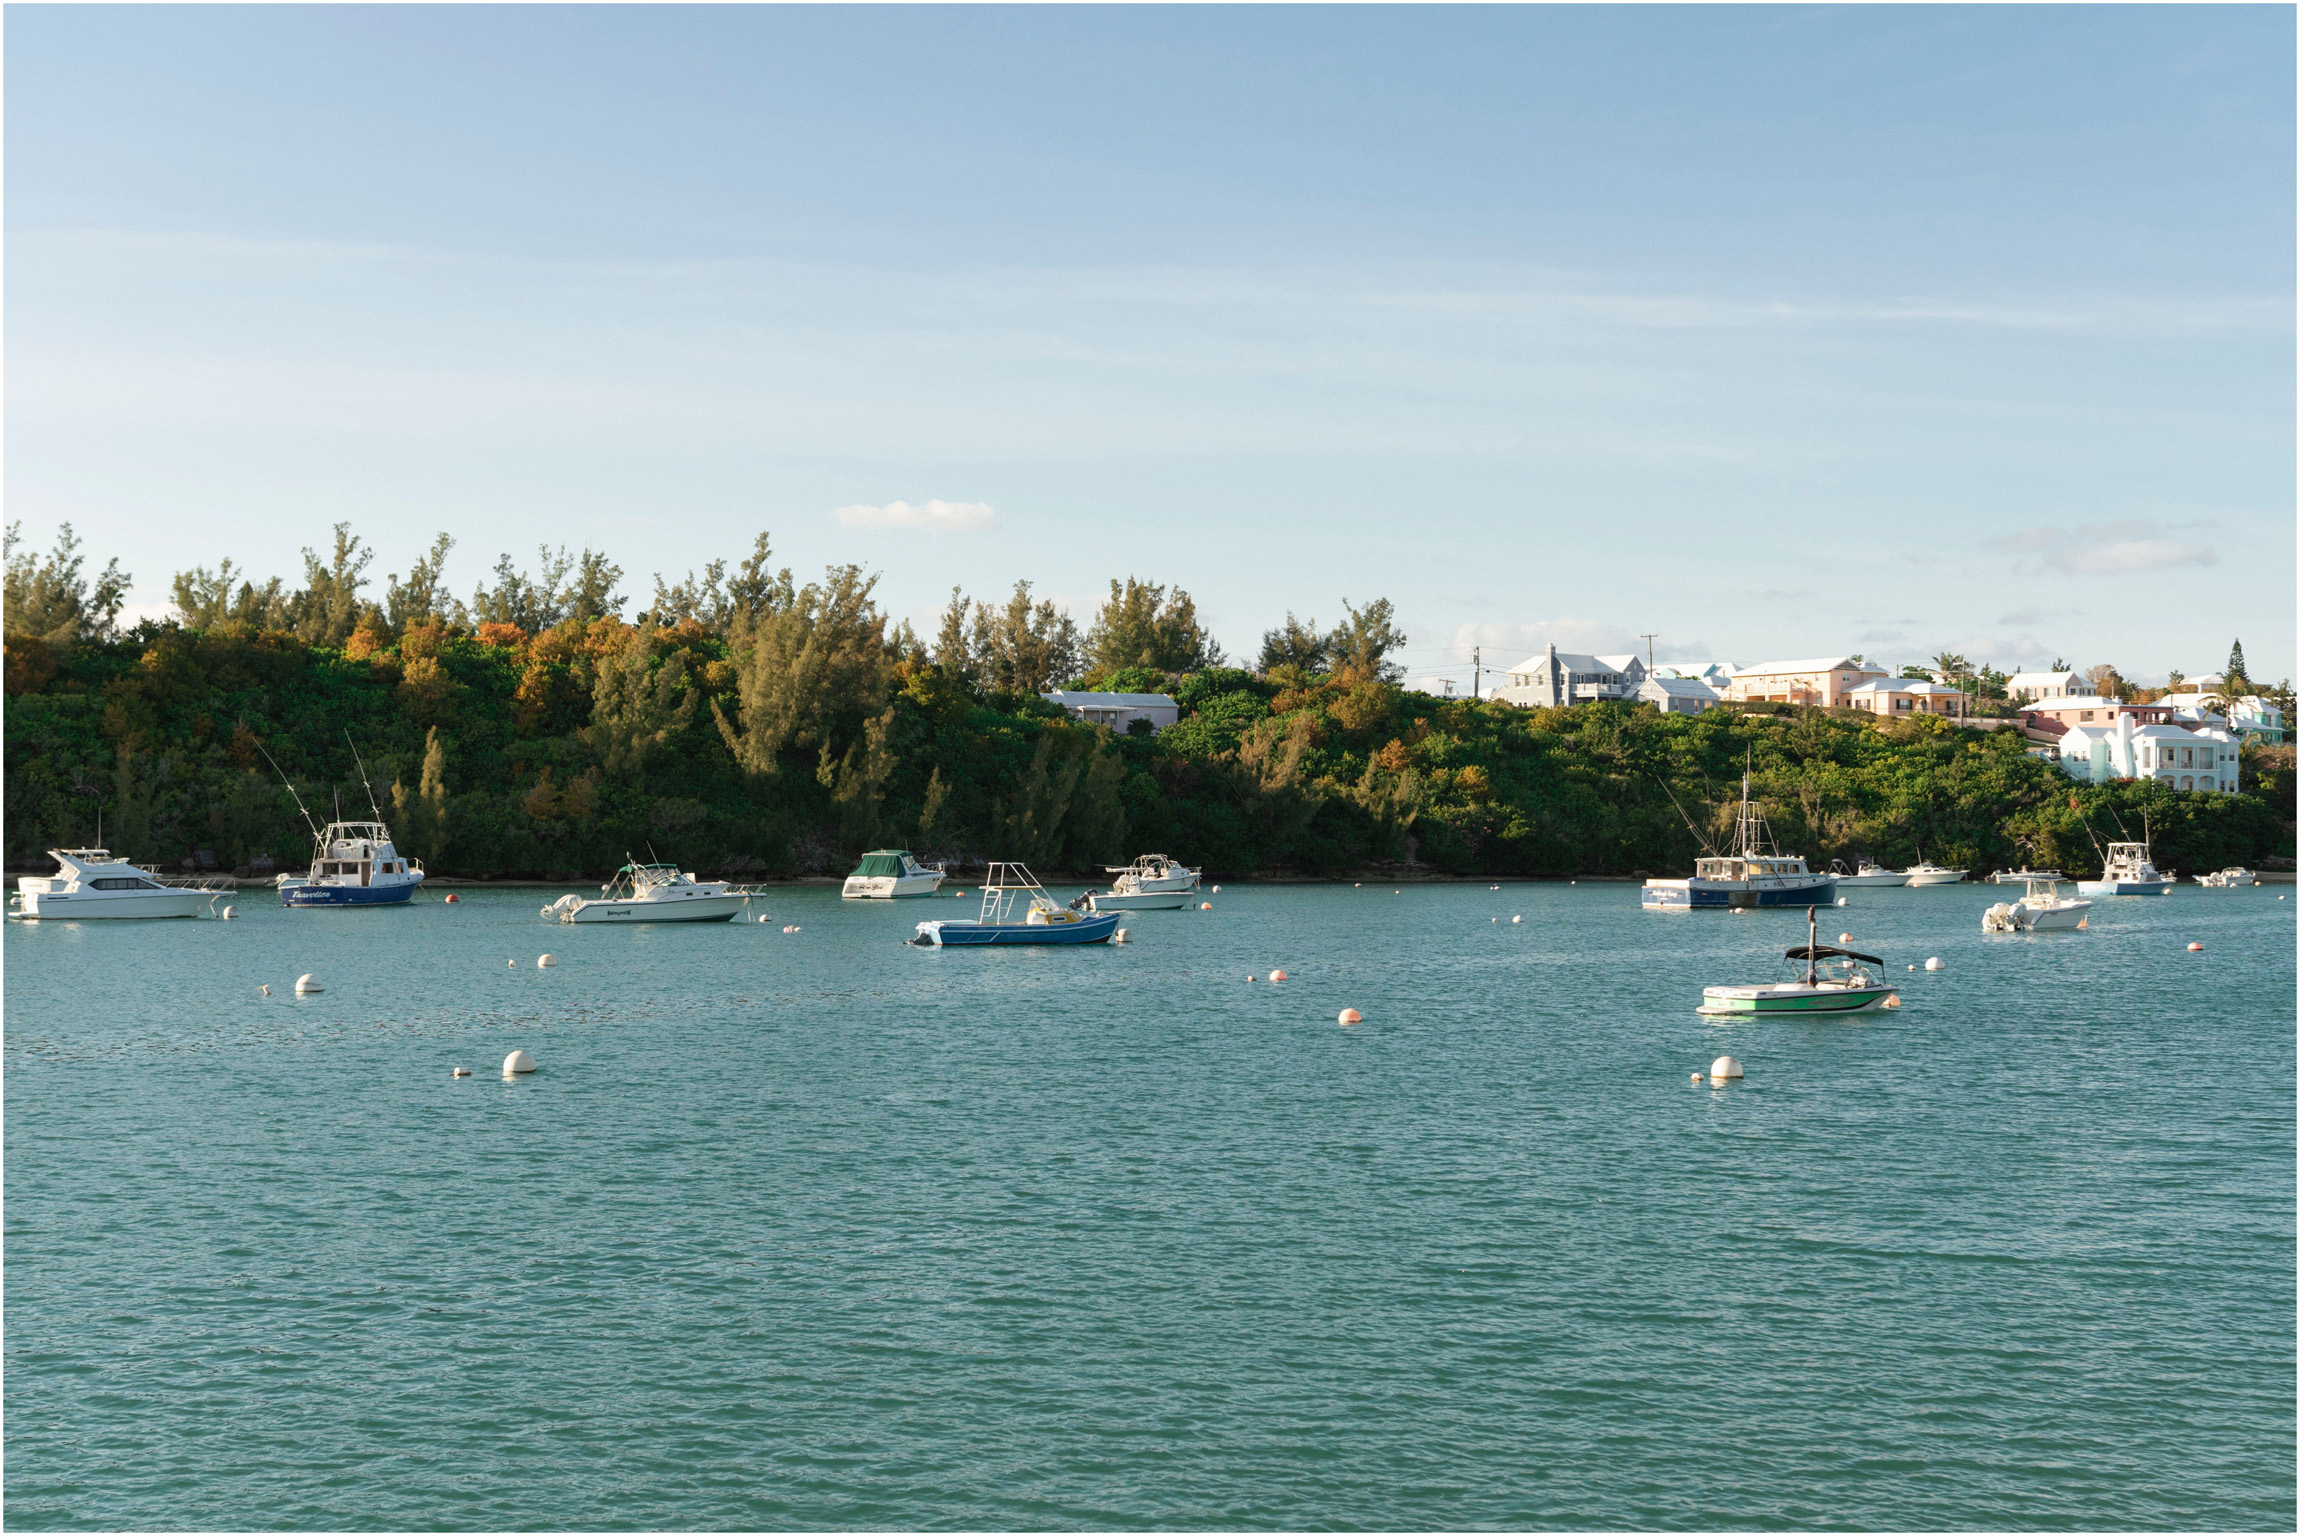 ©FianderFoto_Bermuda Maternity Photographer_Elys Harbour_Ft Scaur_Airbnb_Victoria_Mike_001.jpg